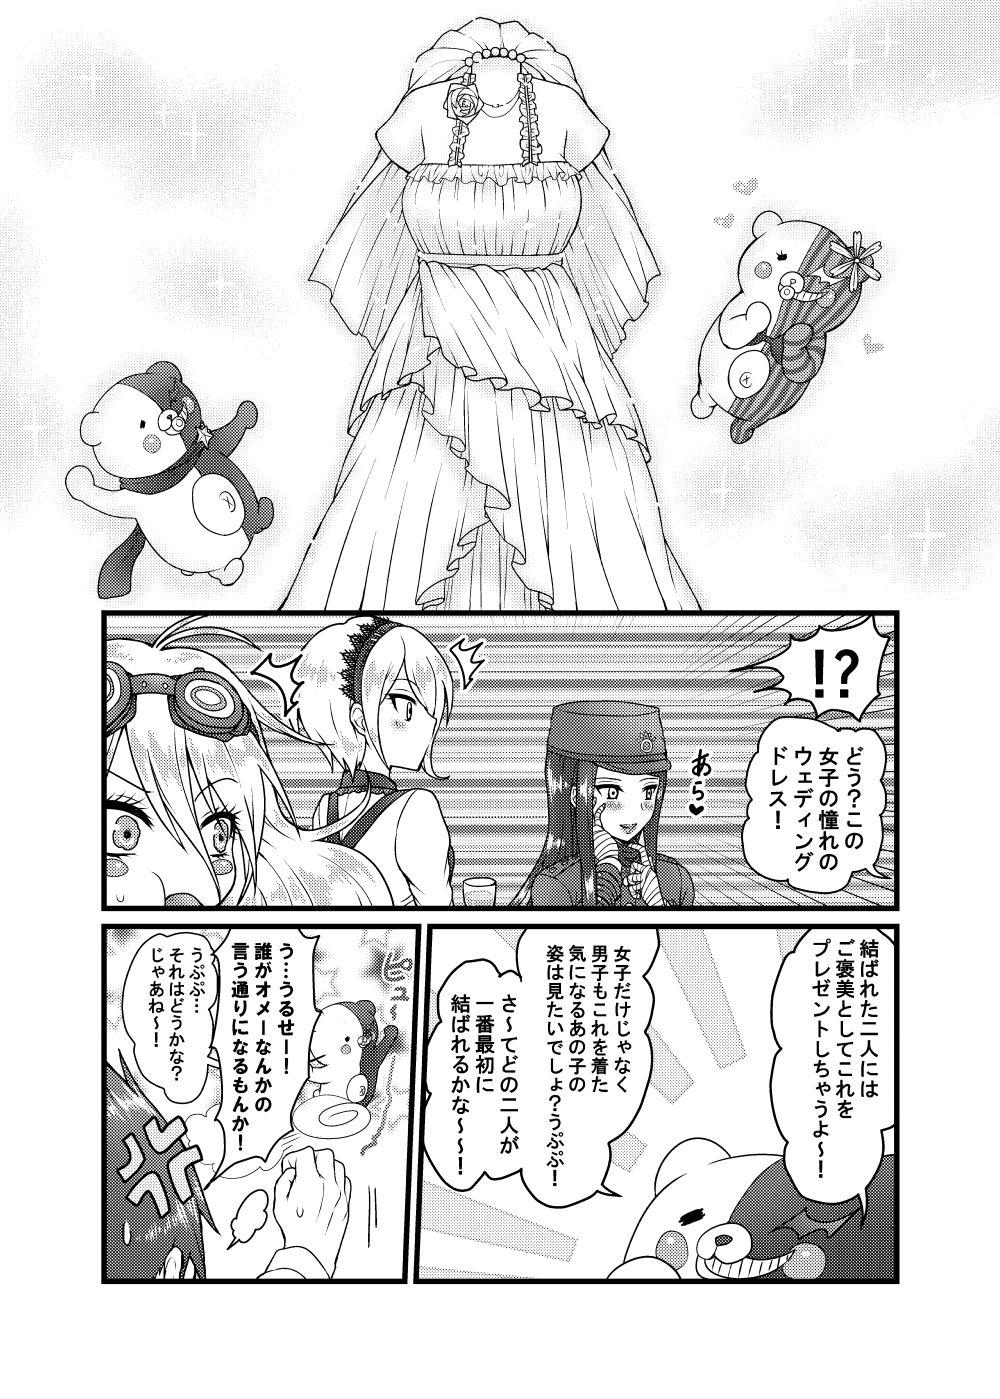 Usotsuki Hanayome 3